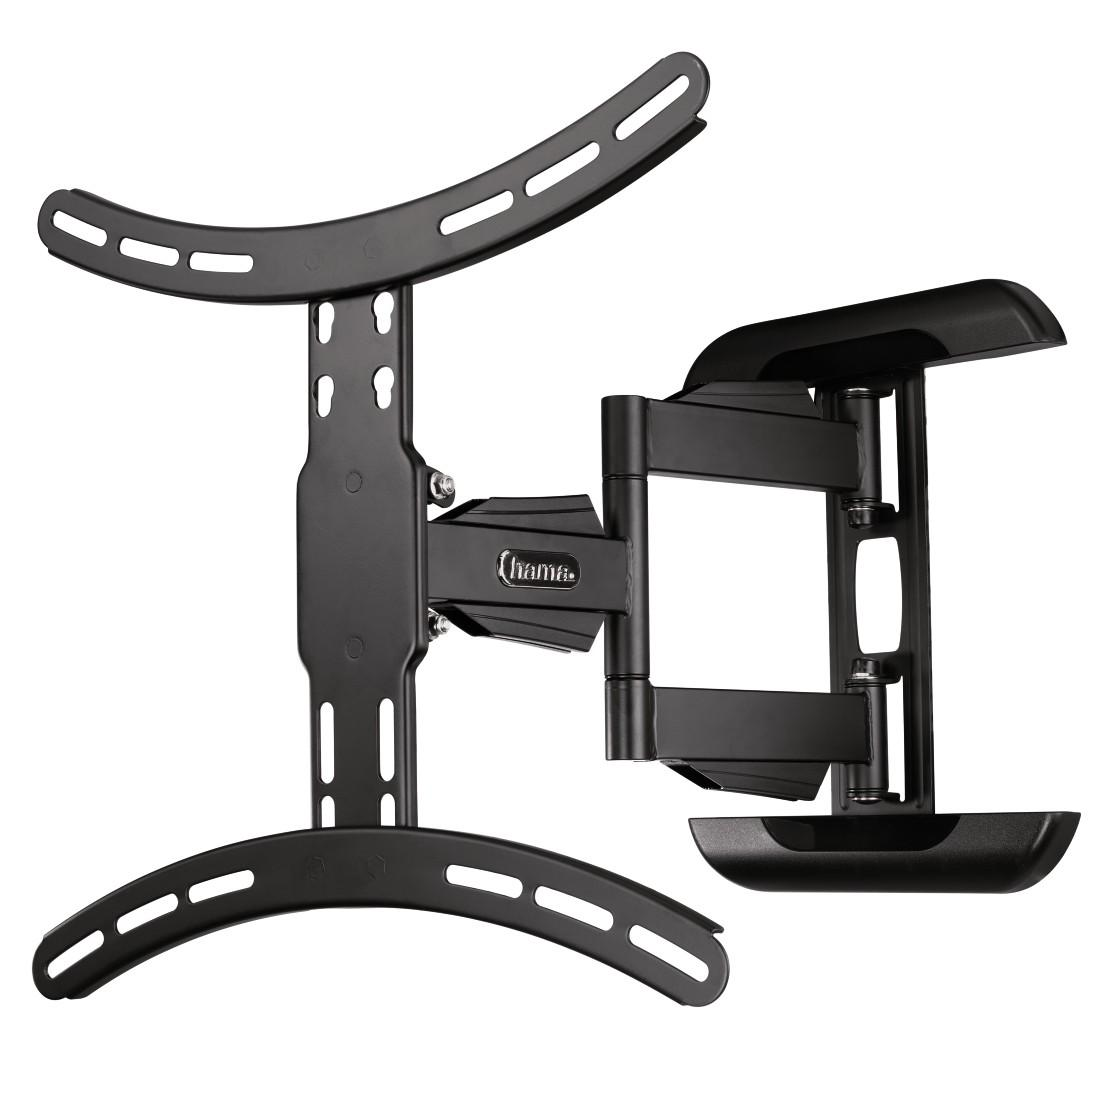 hama tv wandhalterung fullmotion neigbar schwenkbar vollbeweglich f r 81 165 cm diagonale. Black Bedroom Furniture Sets. Home Design Ideas